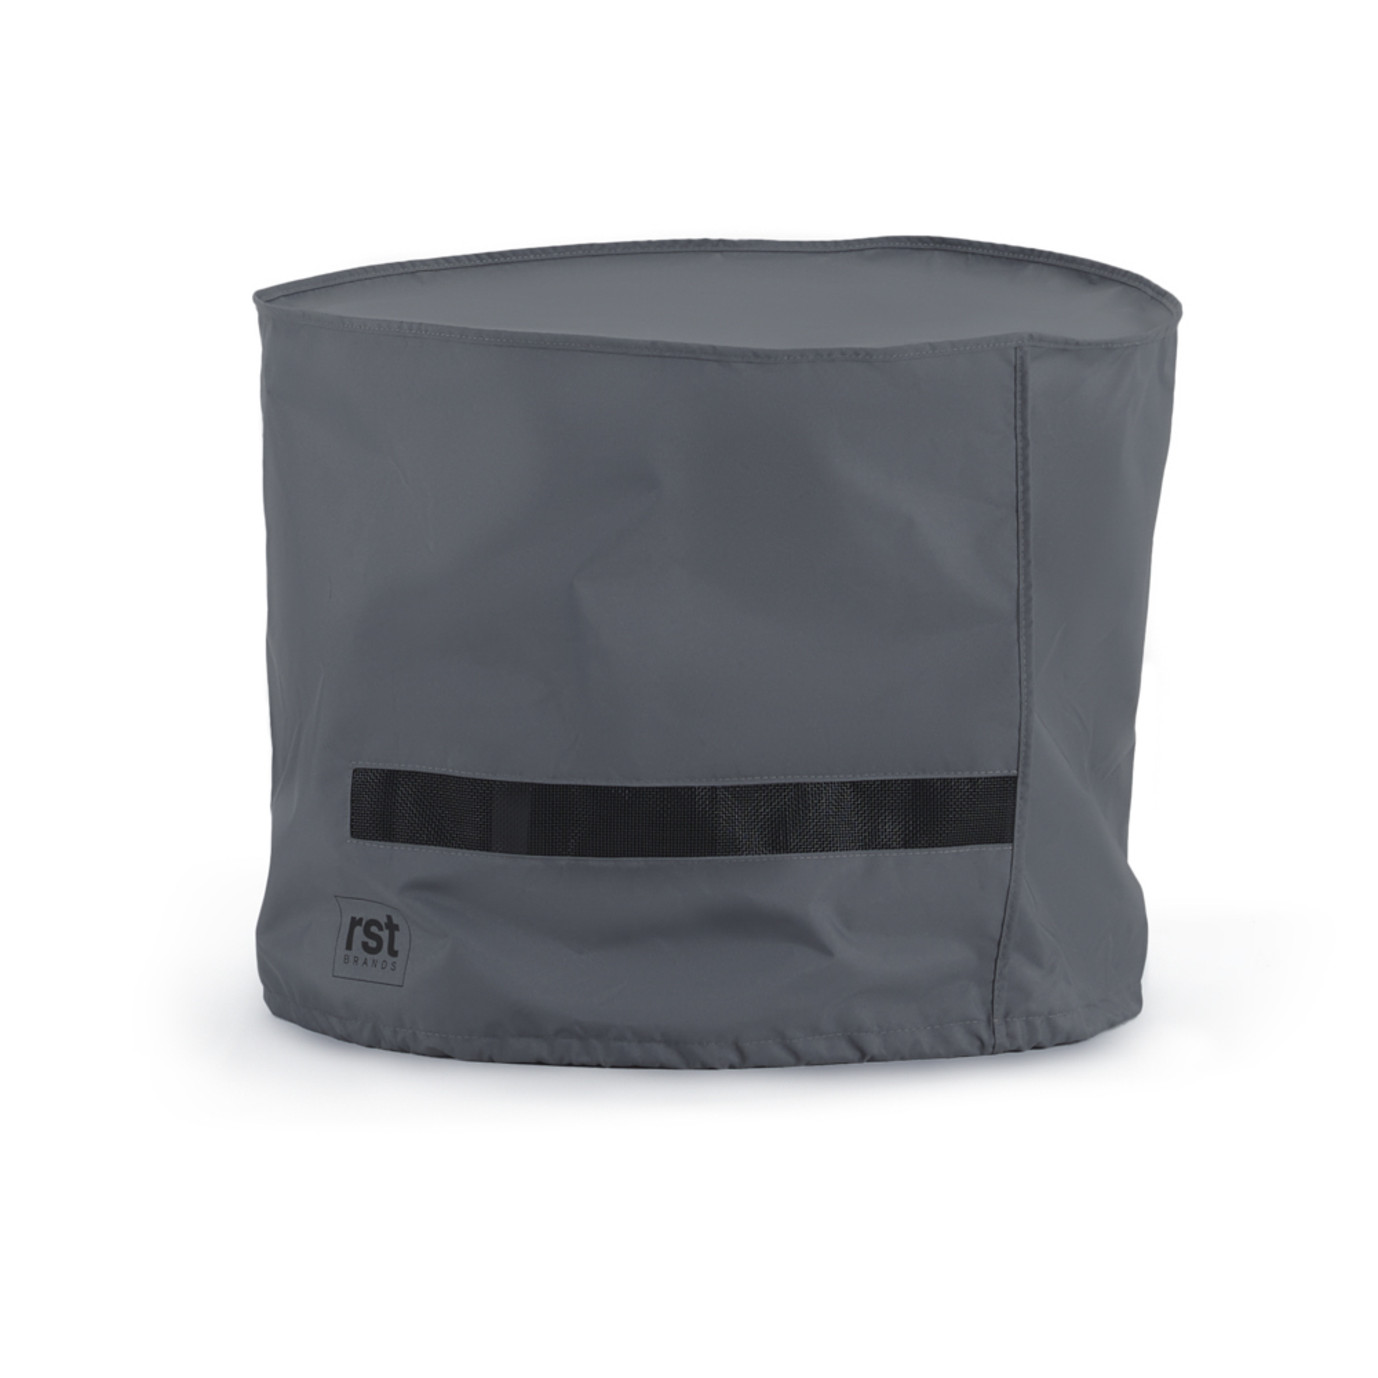 Venetia™ Side Table Furniture Cover